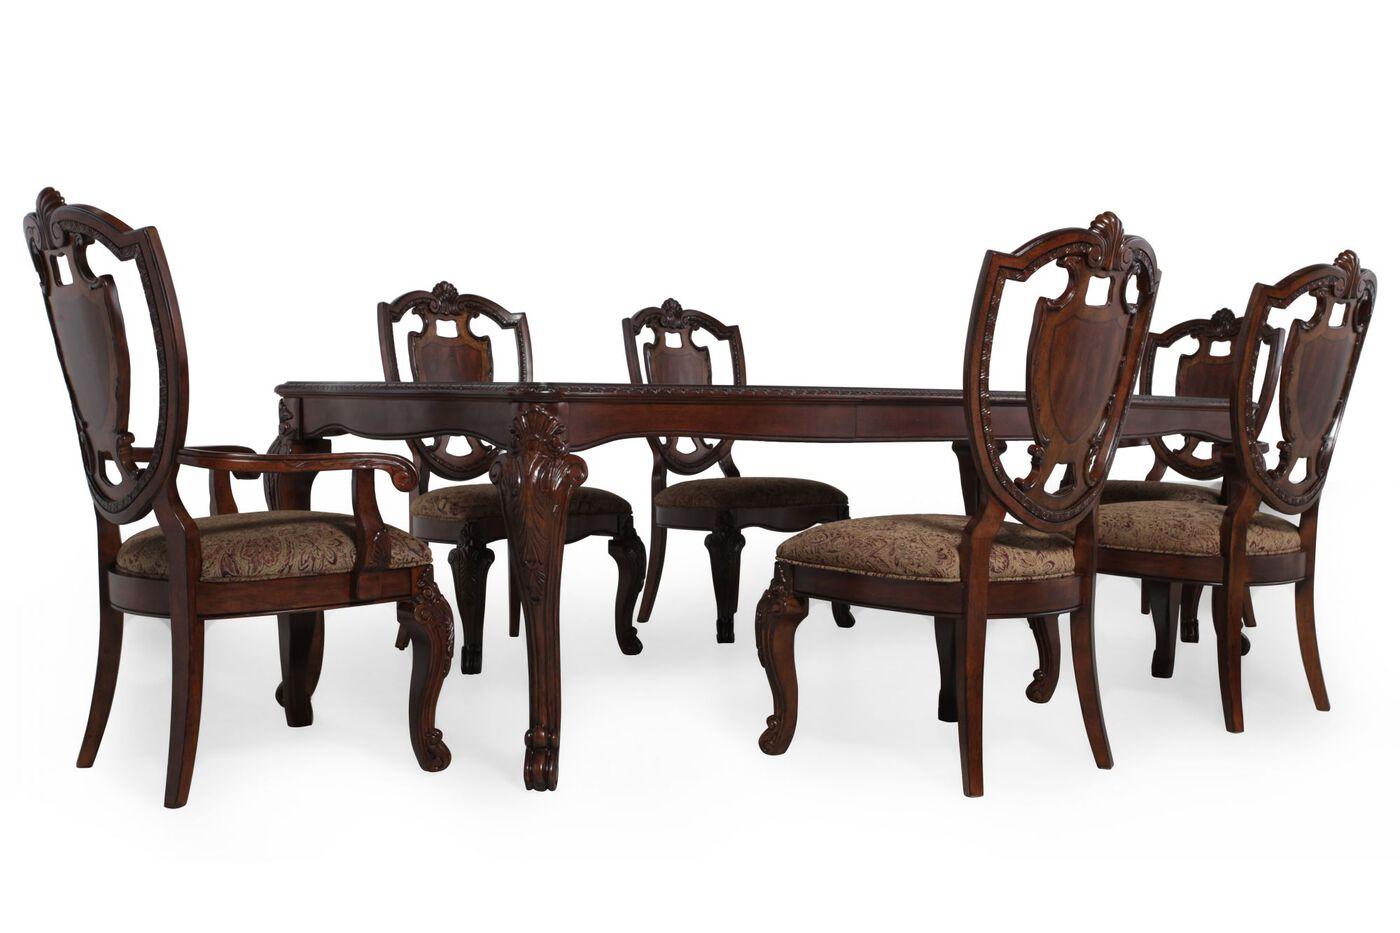 ART Furniture Old World Seven Piece Leg Table Dining  : ARTF 14325E047LEG5E0477PC from www.mathisbrothers.com size 1400 x 933 jpeg 104kB